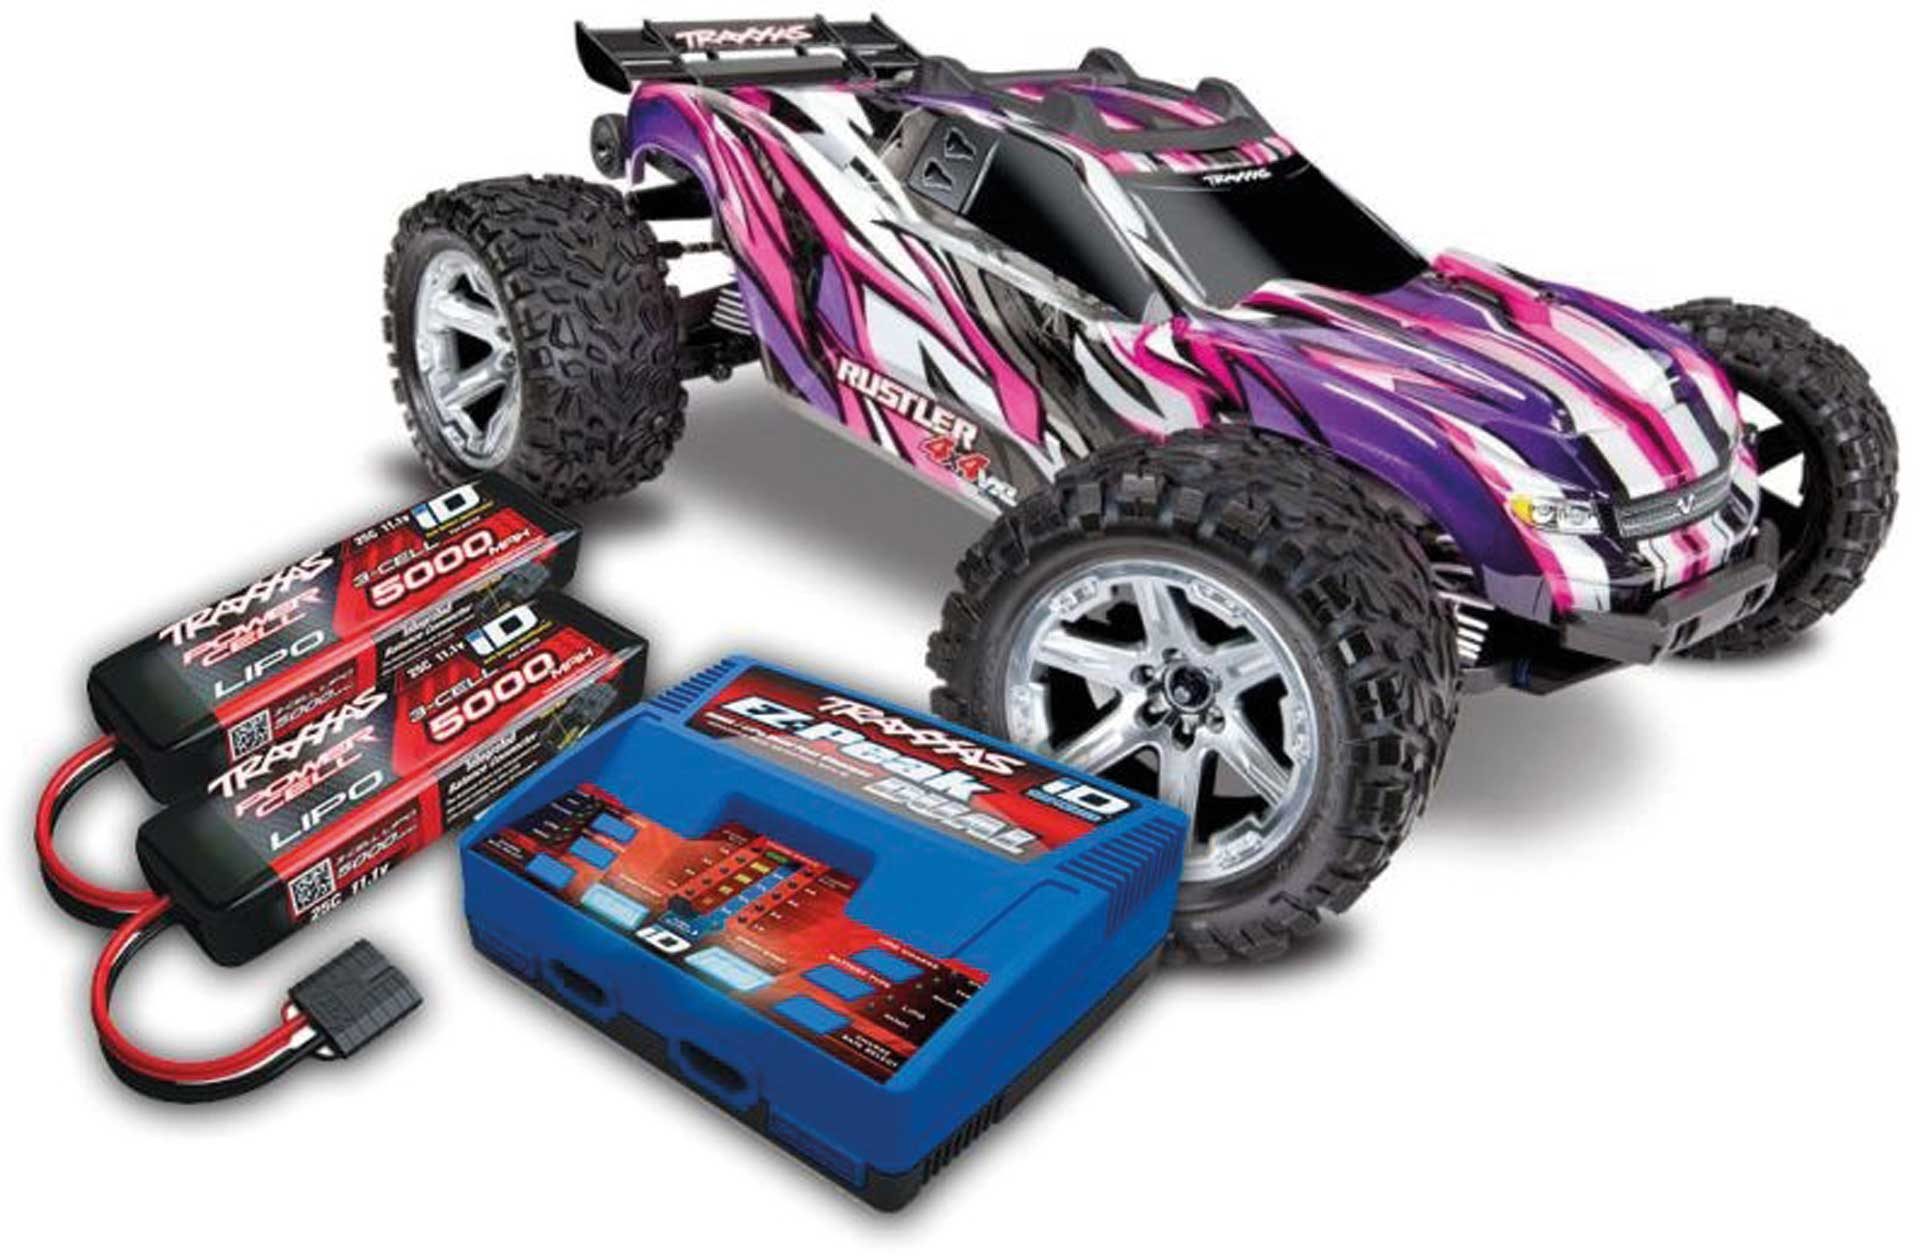 TRAXXAS RUSTLER 4X4 VXL BRUSHLESS PINK RTR MIT AKKU/LADER-SET *AKTION* 1/10 4WD STADIUM TRUCK (TRX67076-4 + TRX2990GX)